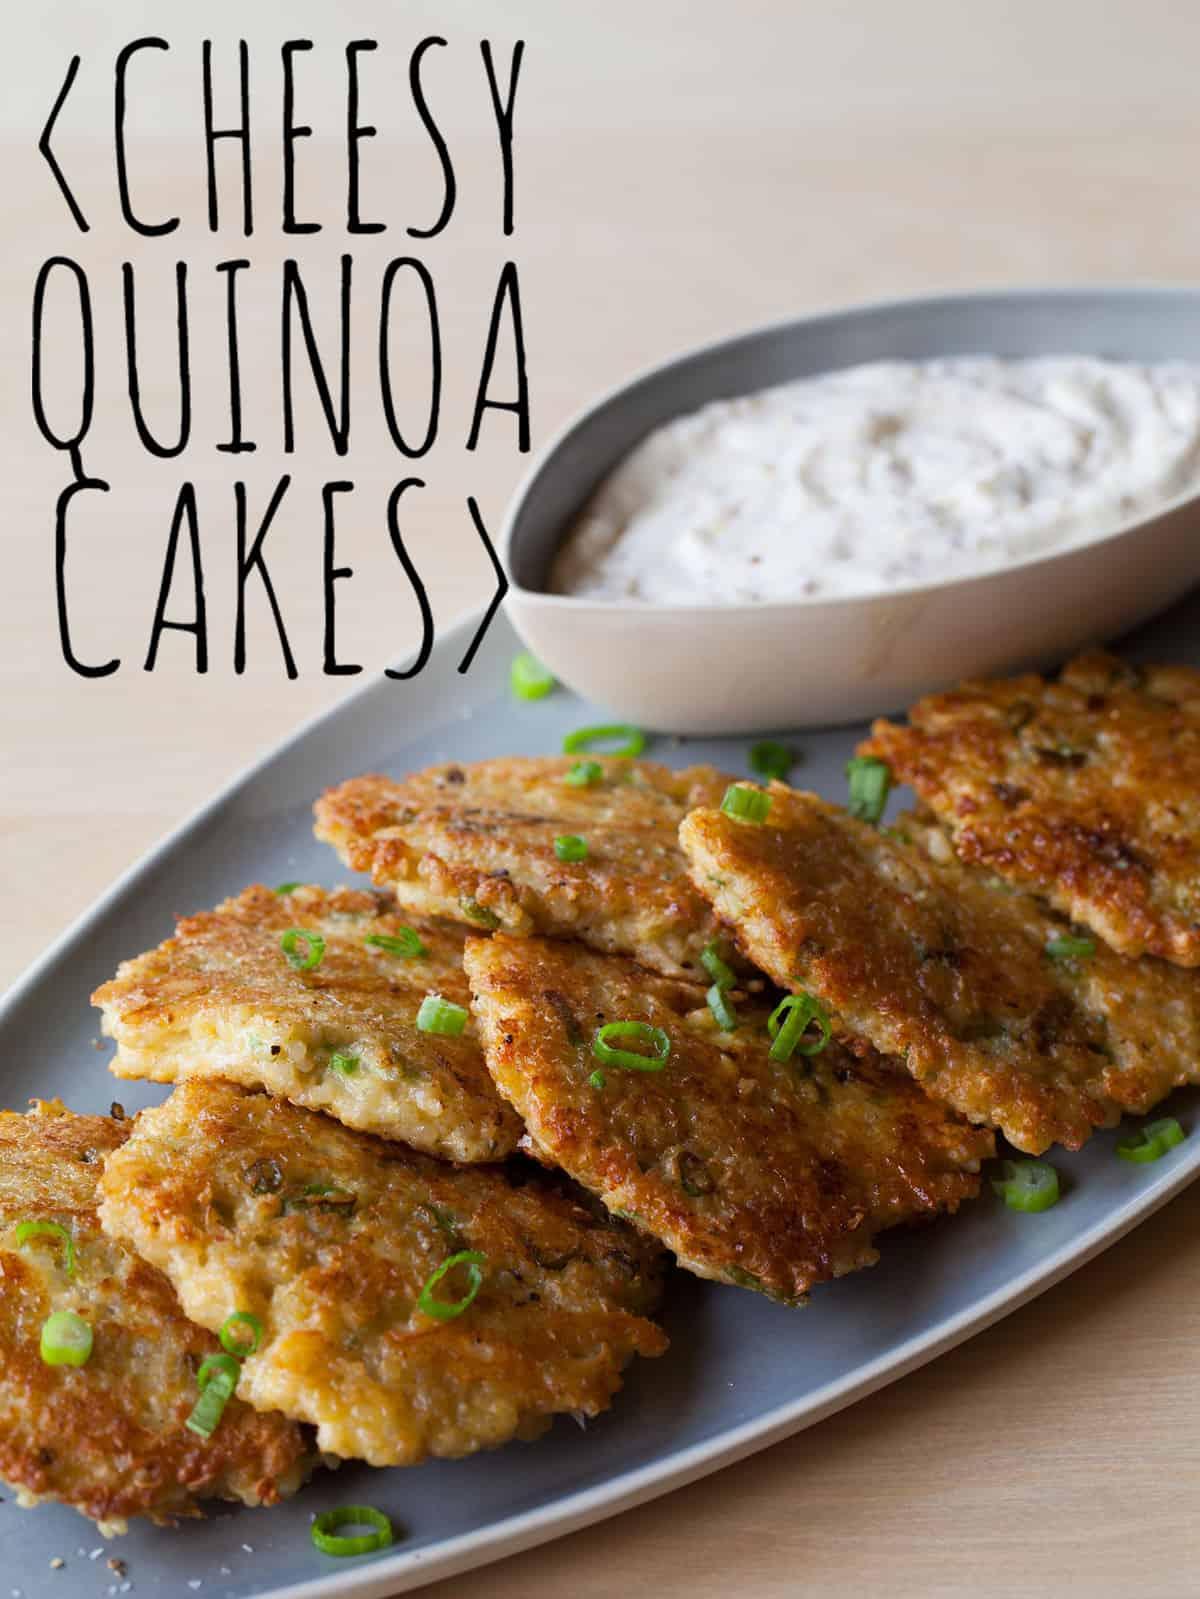 Cheesy Quinoa Cakes | appetizer recipe | Spoon Fork Bacon